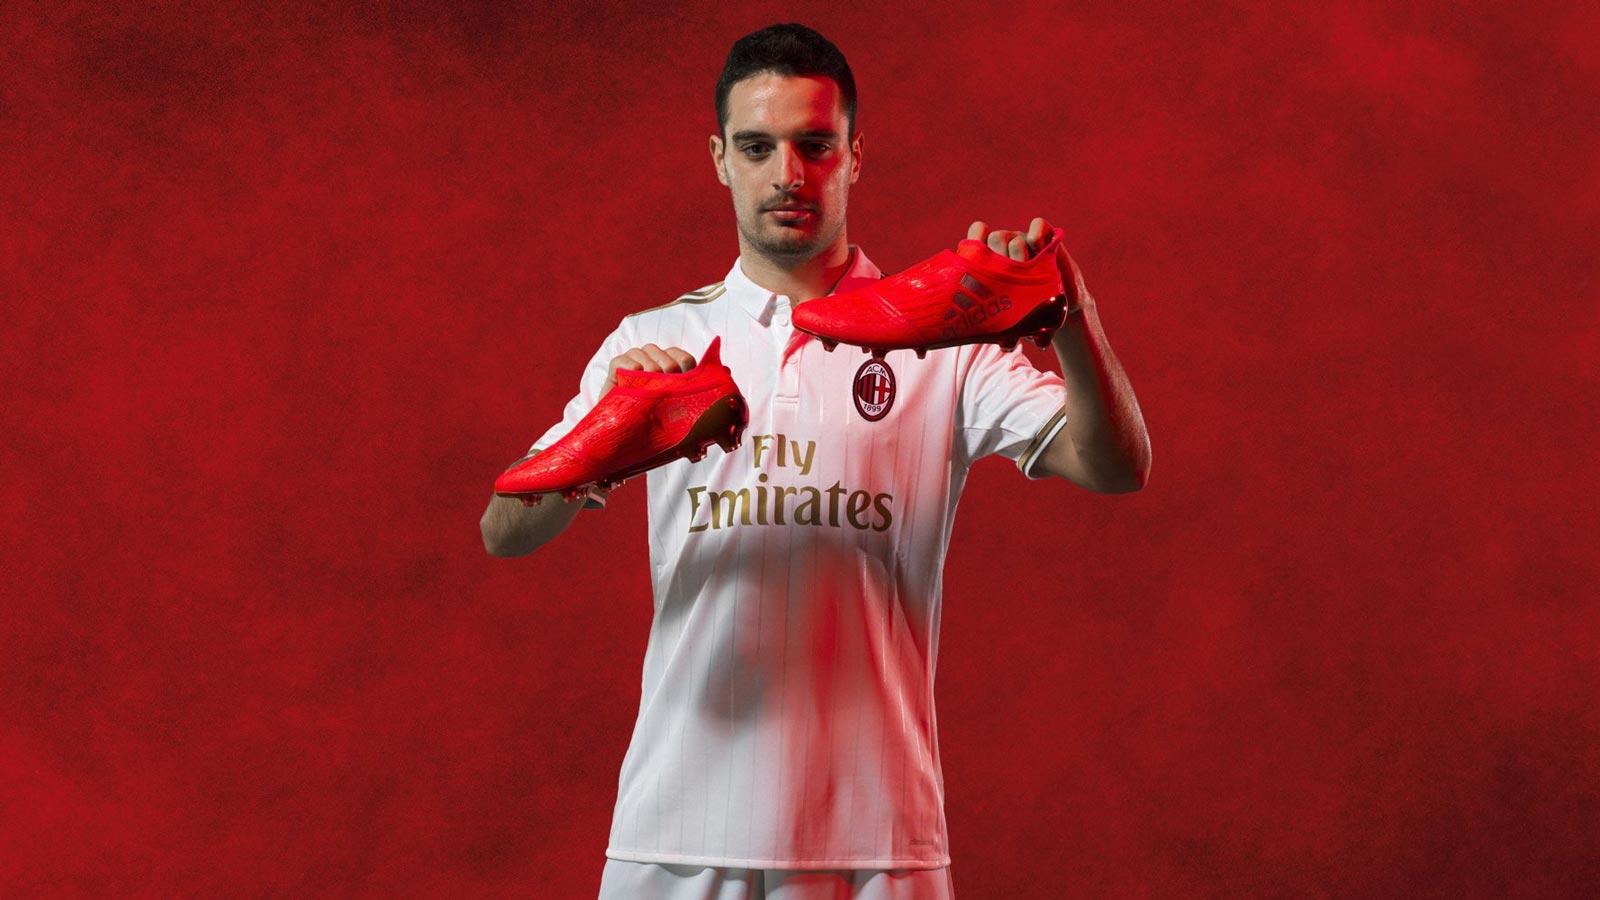 Psg Wallpaper Hd Ac Milan 16 17 Away Kit Released Footy Headlines